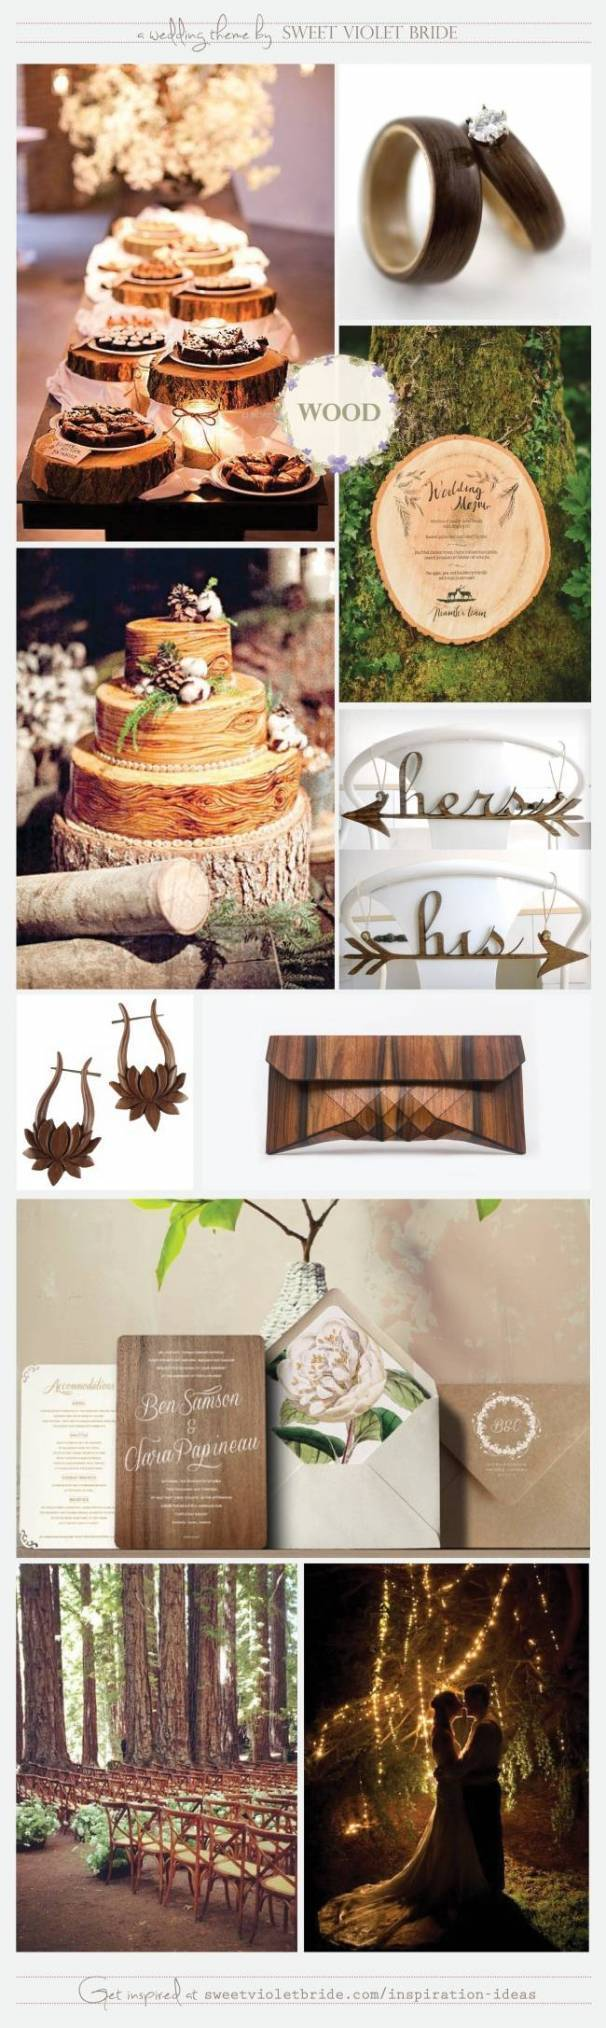 Wedding Inspiration Board #26: Rustic Wood